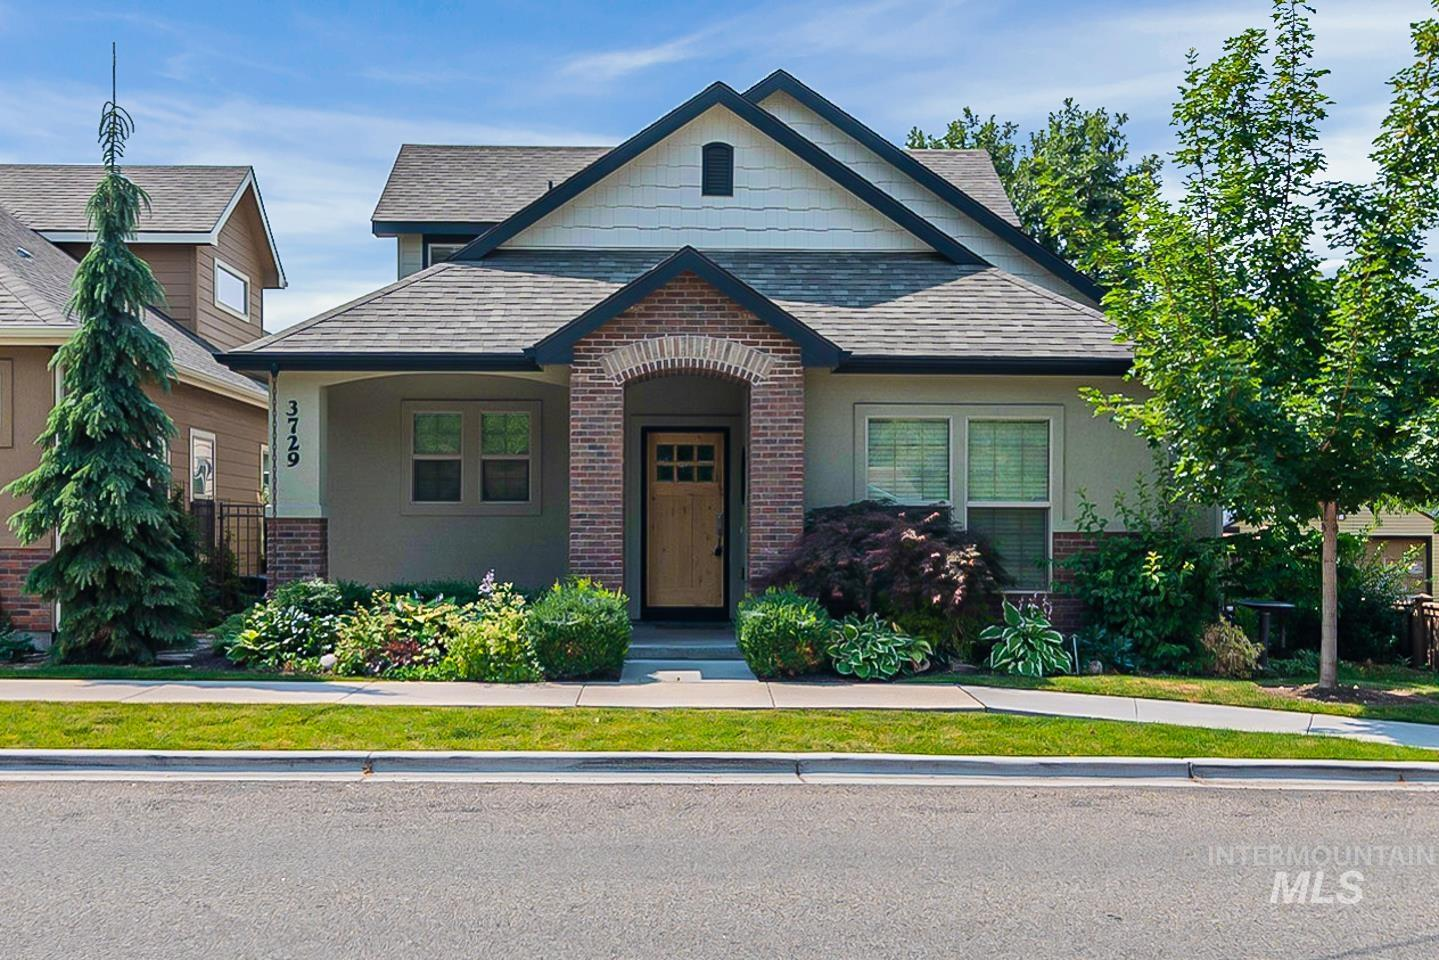 3729 W Catalpa Property Photo